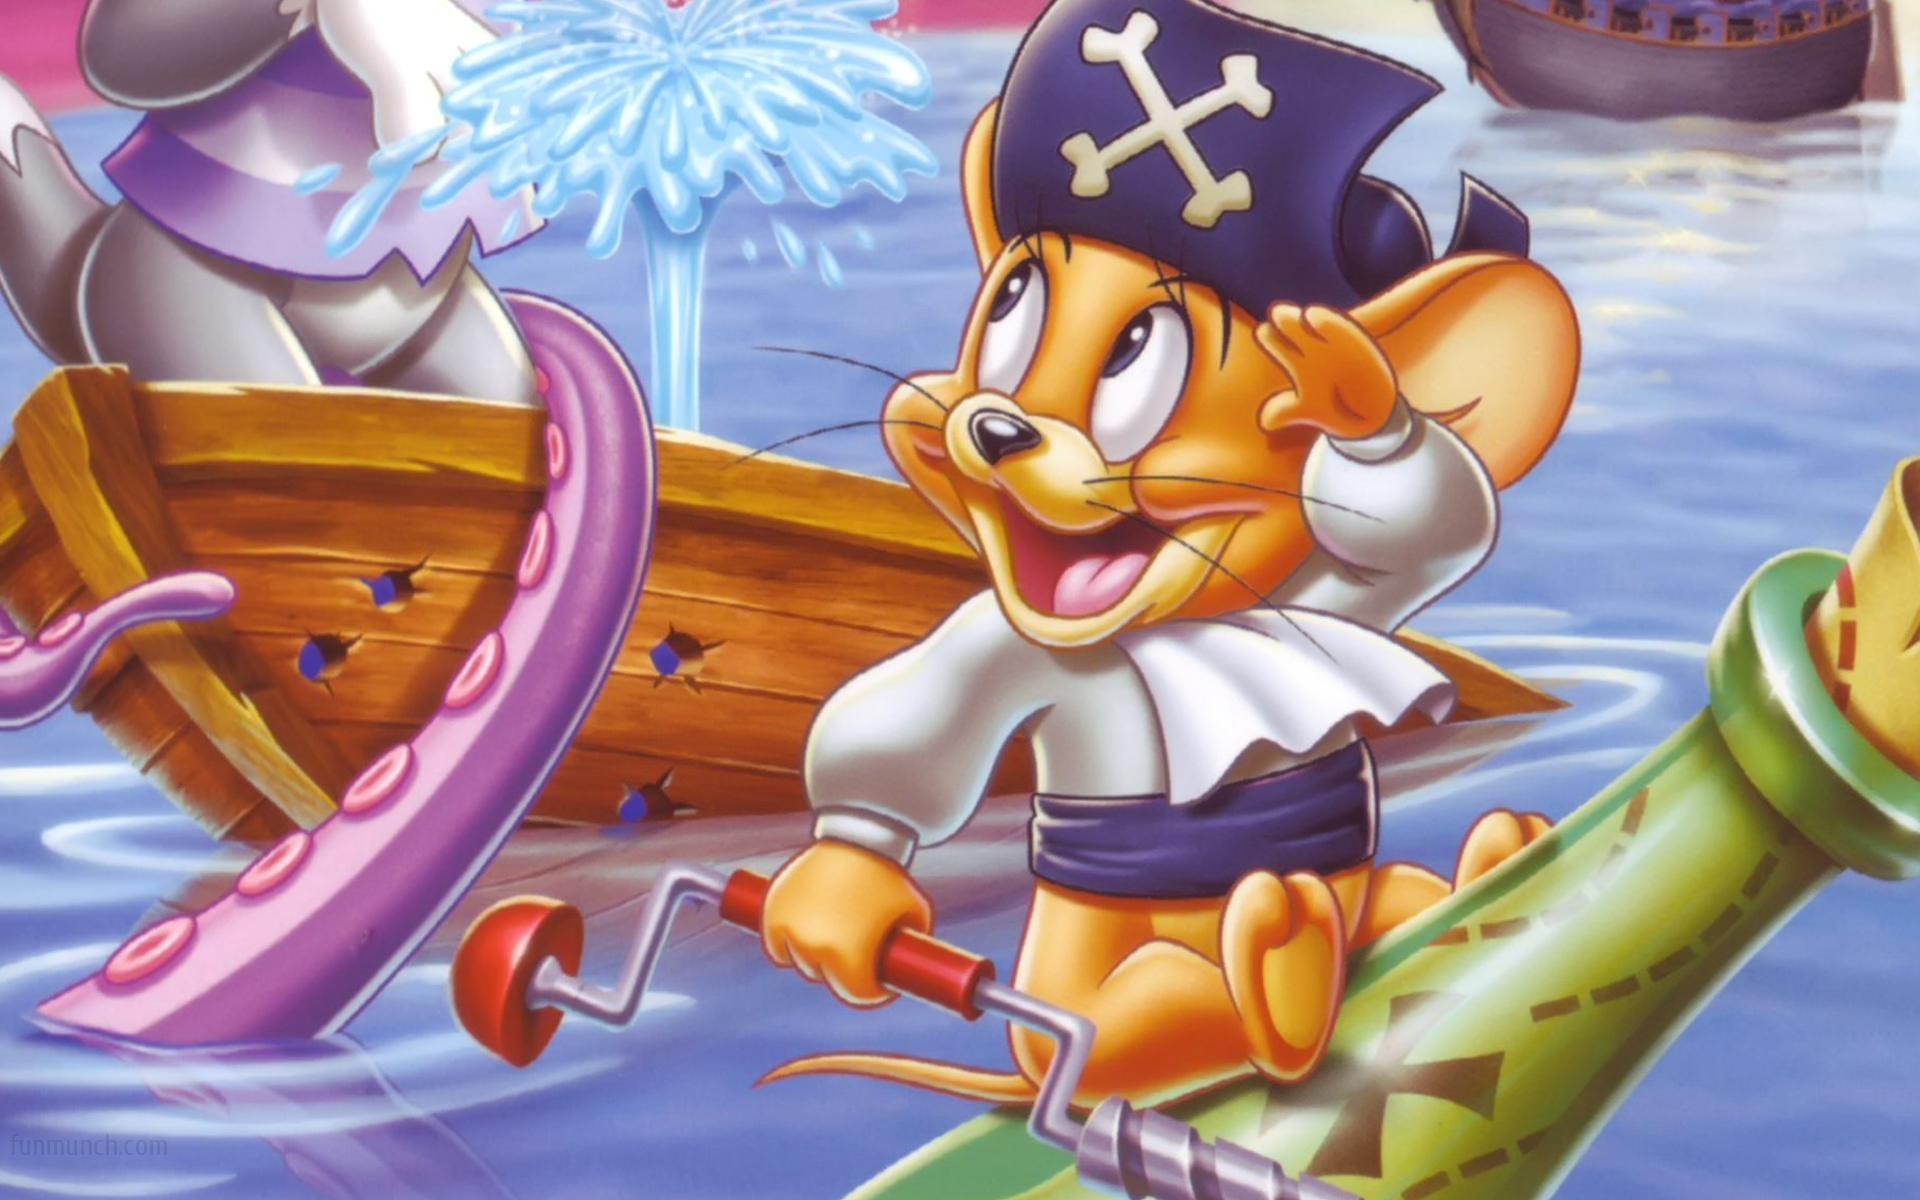 Ultra Hd Tom And Jerry Wallpaper Hd 1920x1200 Wallpaper Teahub Io